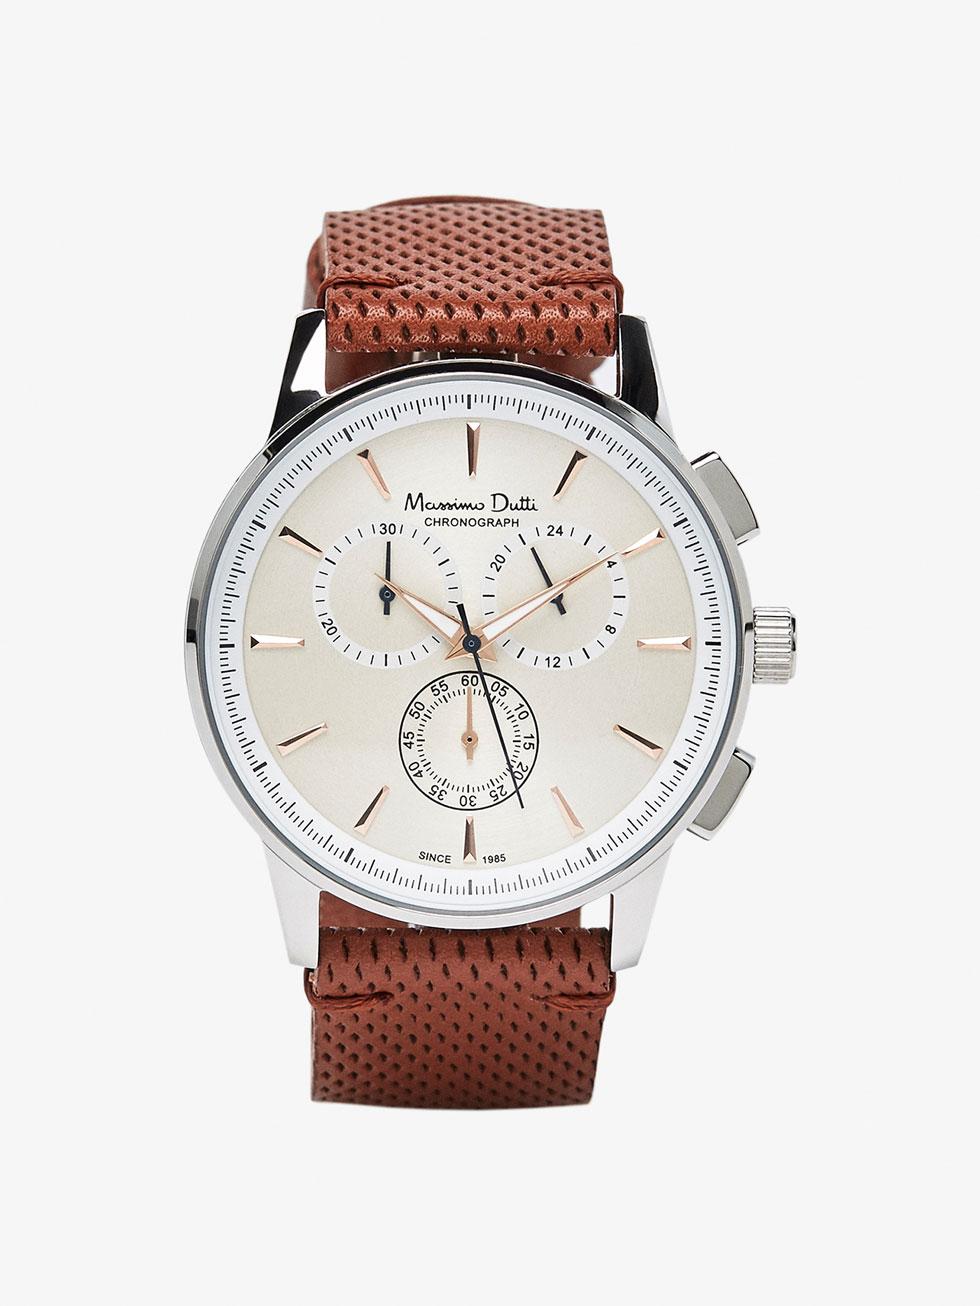 Lo ultimo en relojes masculinos de Massimo Dutti 5